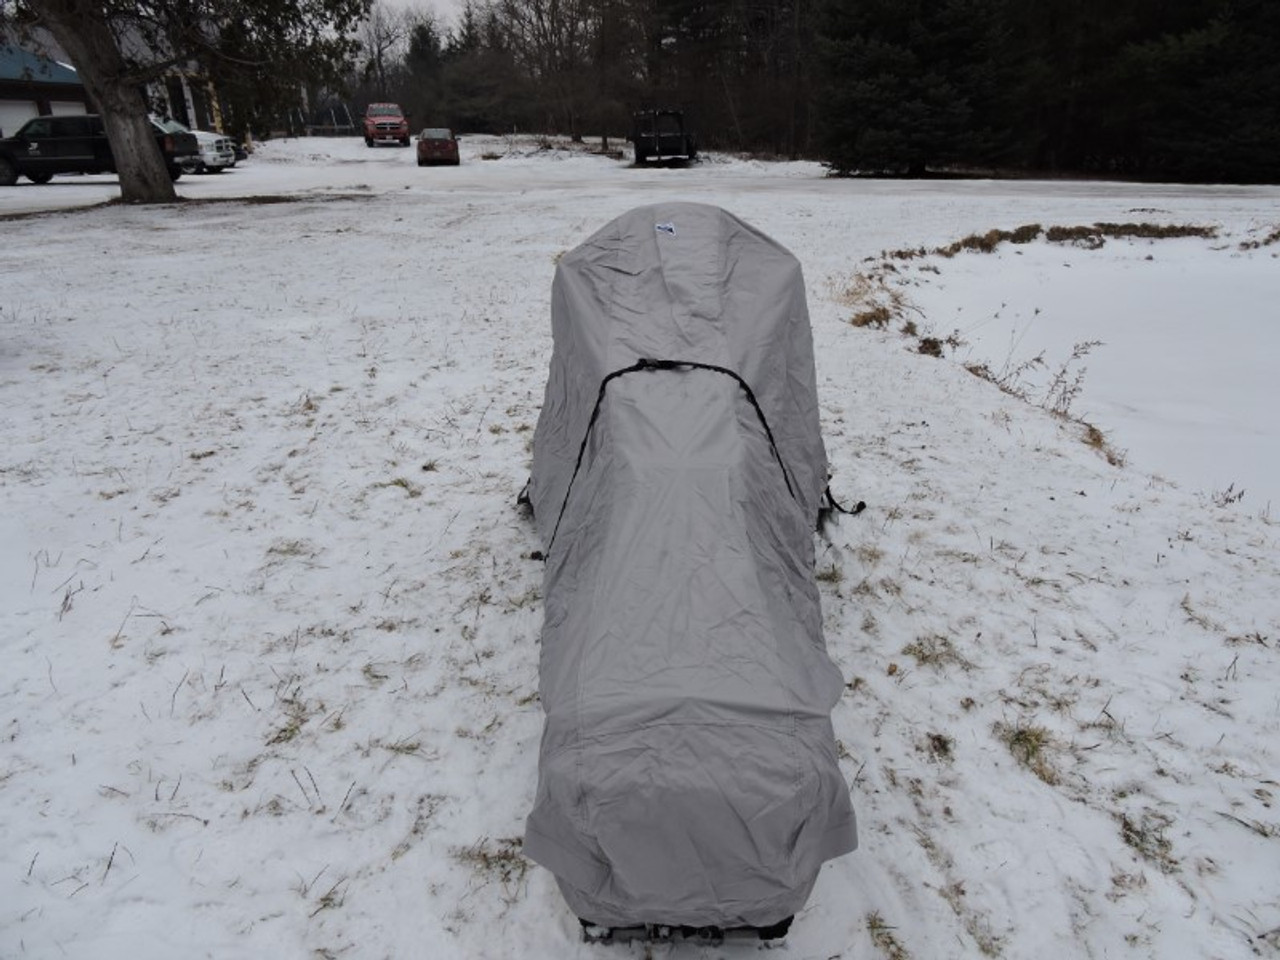 Venture snowmobile cover rear view